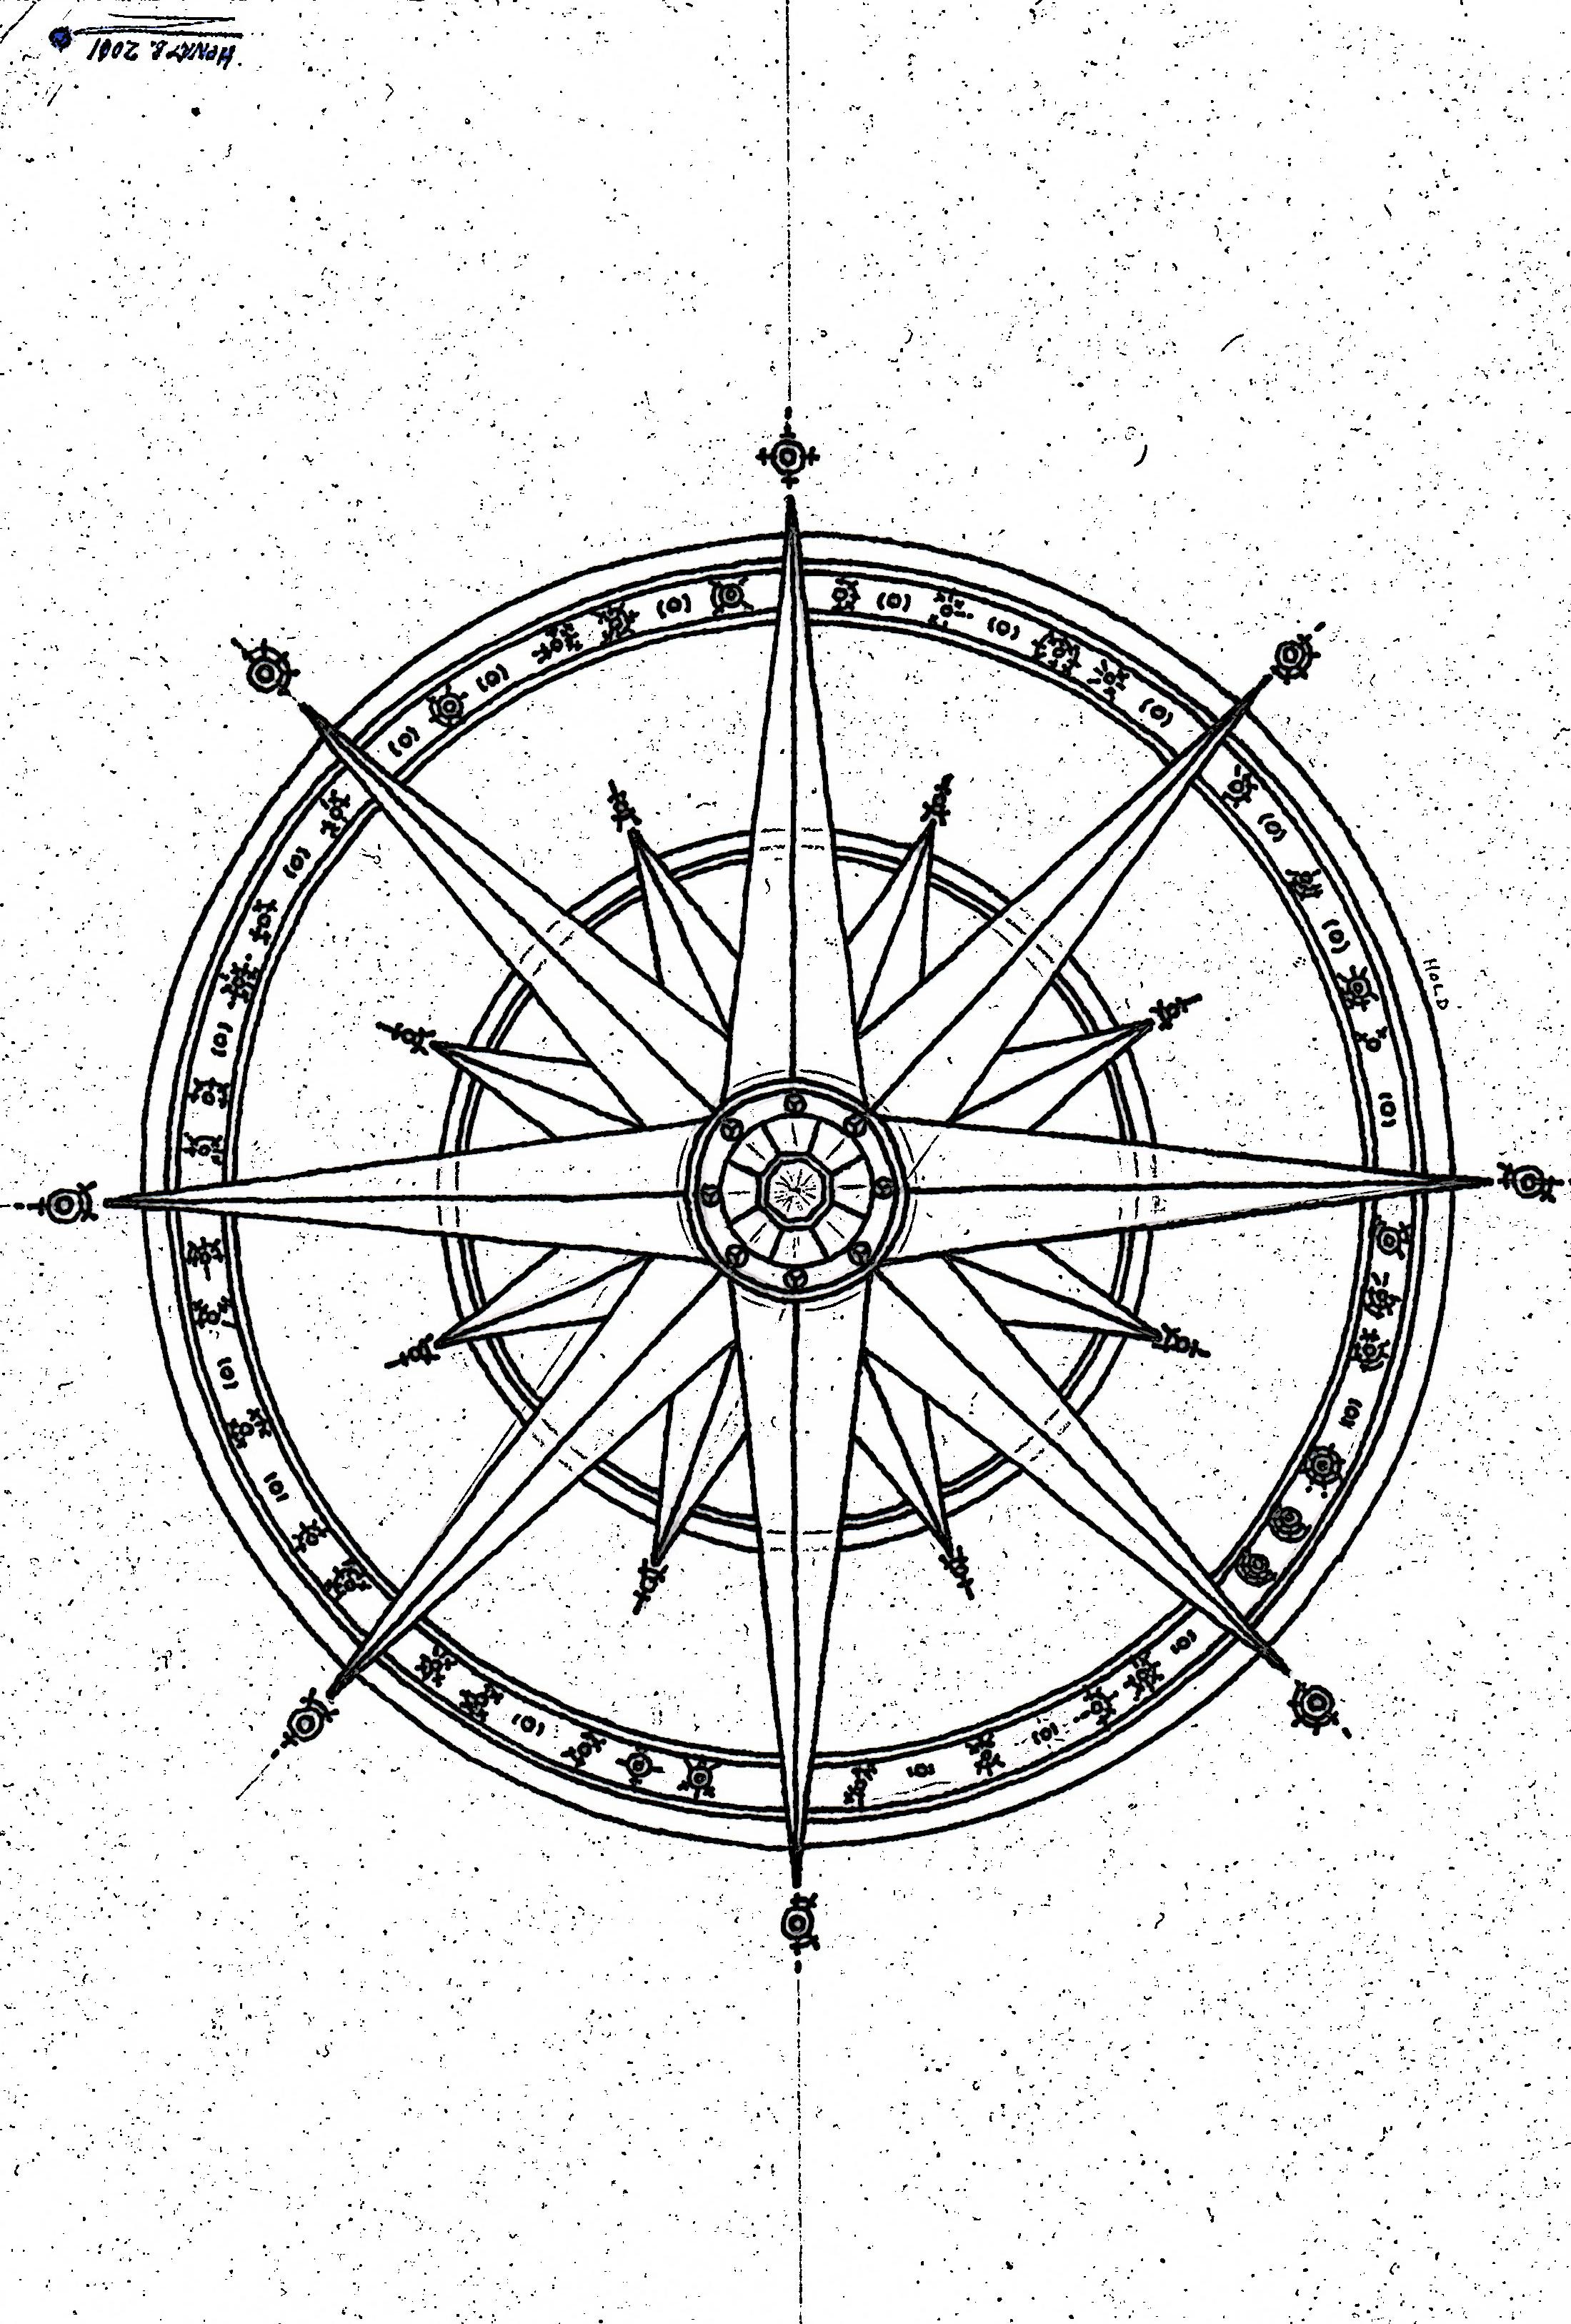 Drawn compass simple black Tenebrae com com Athalai Simple